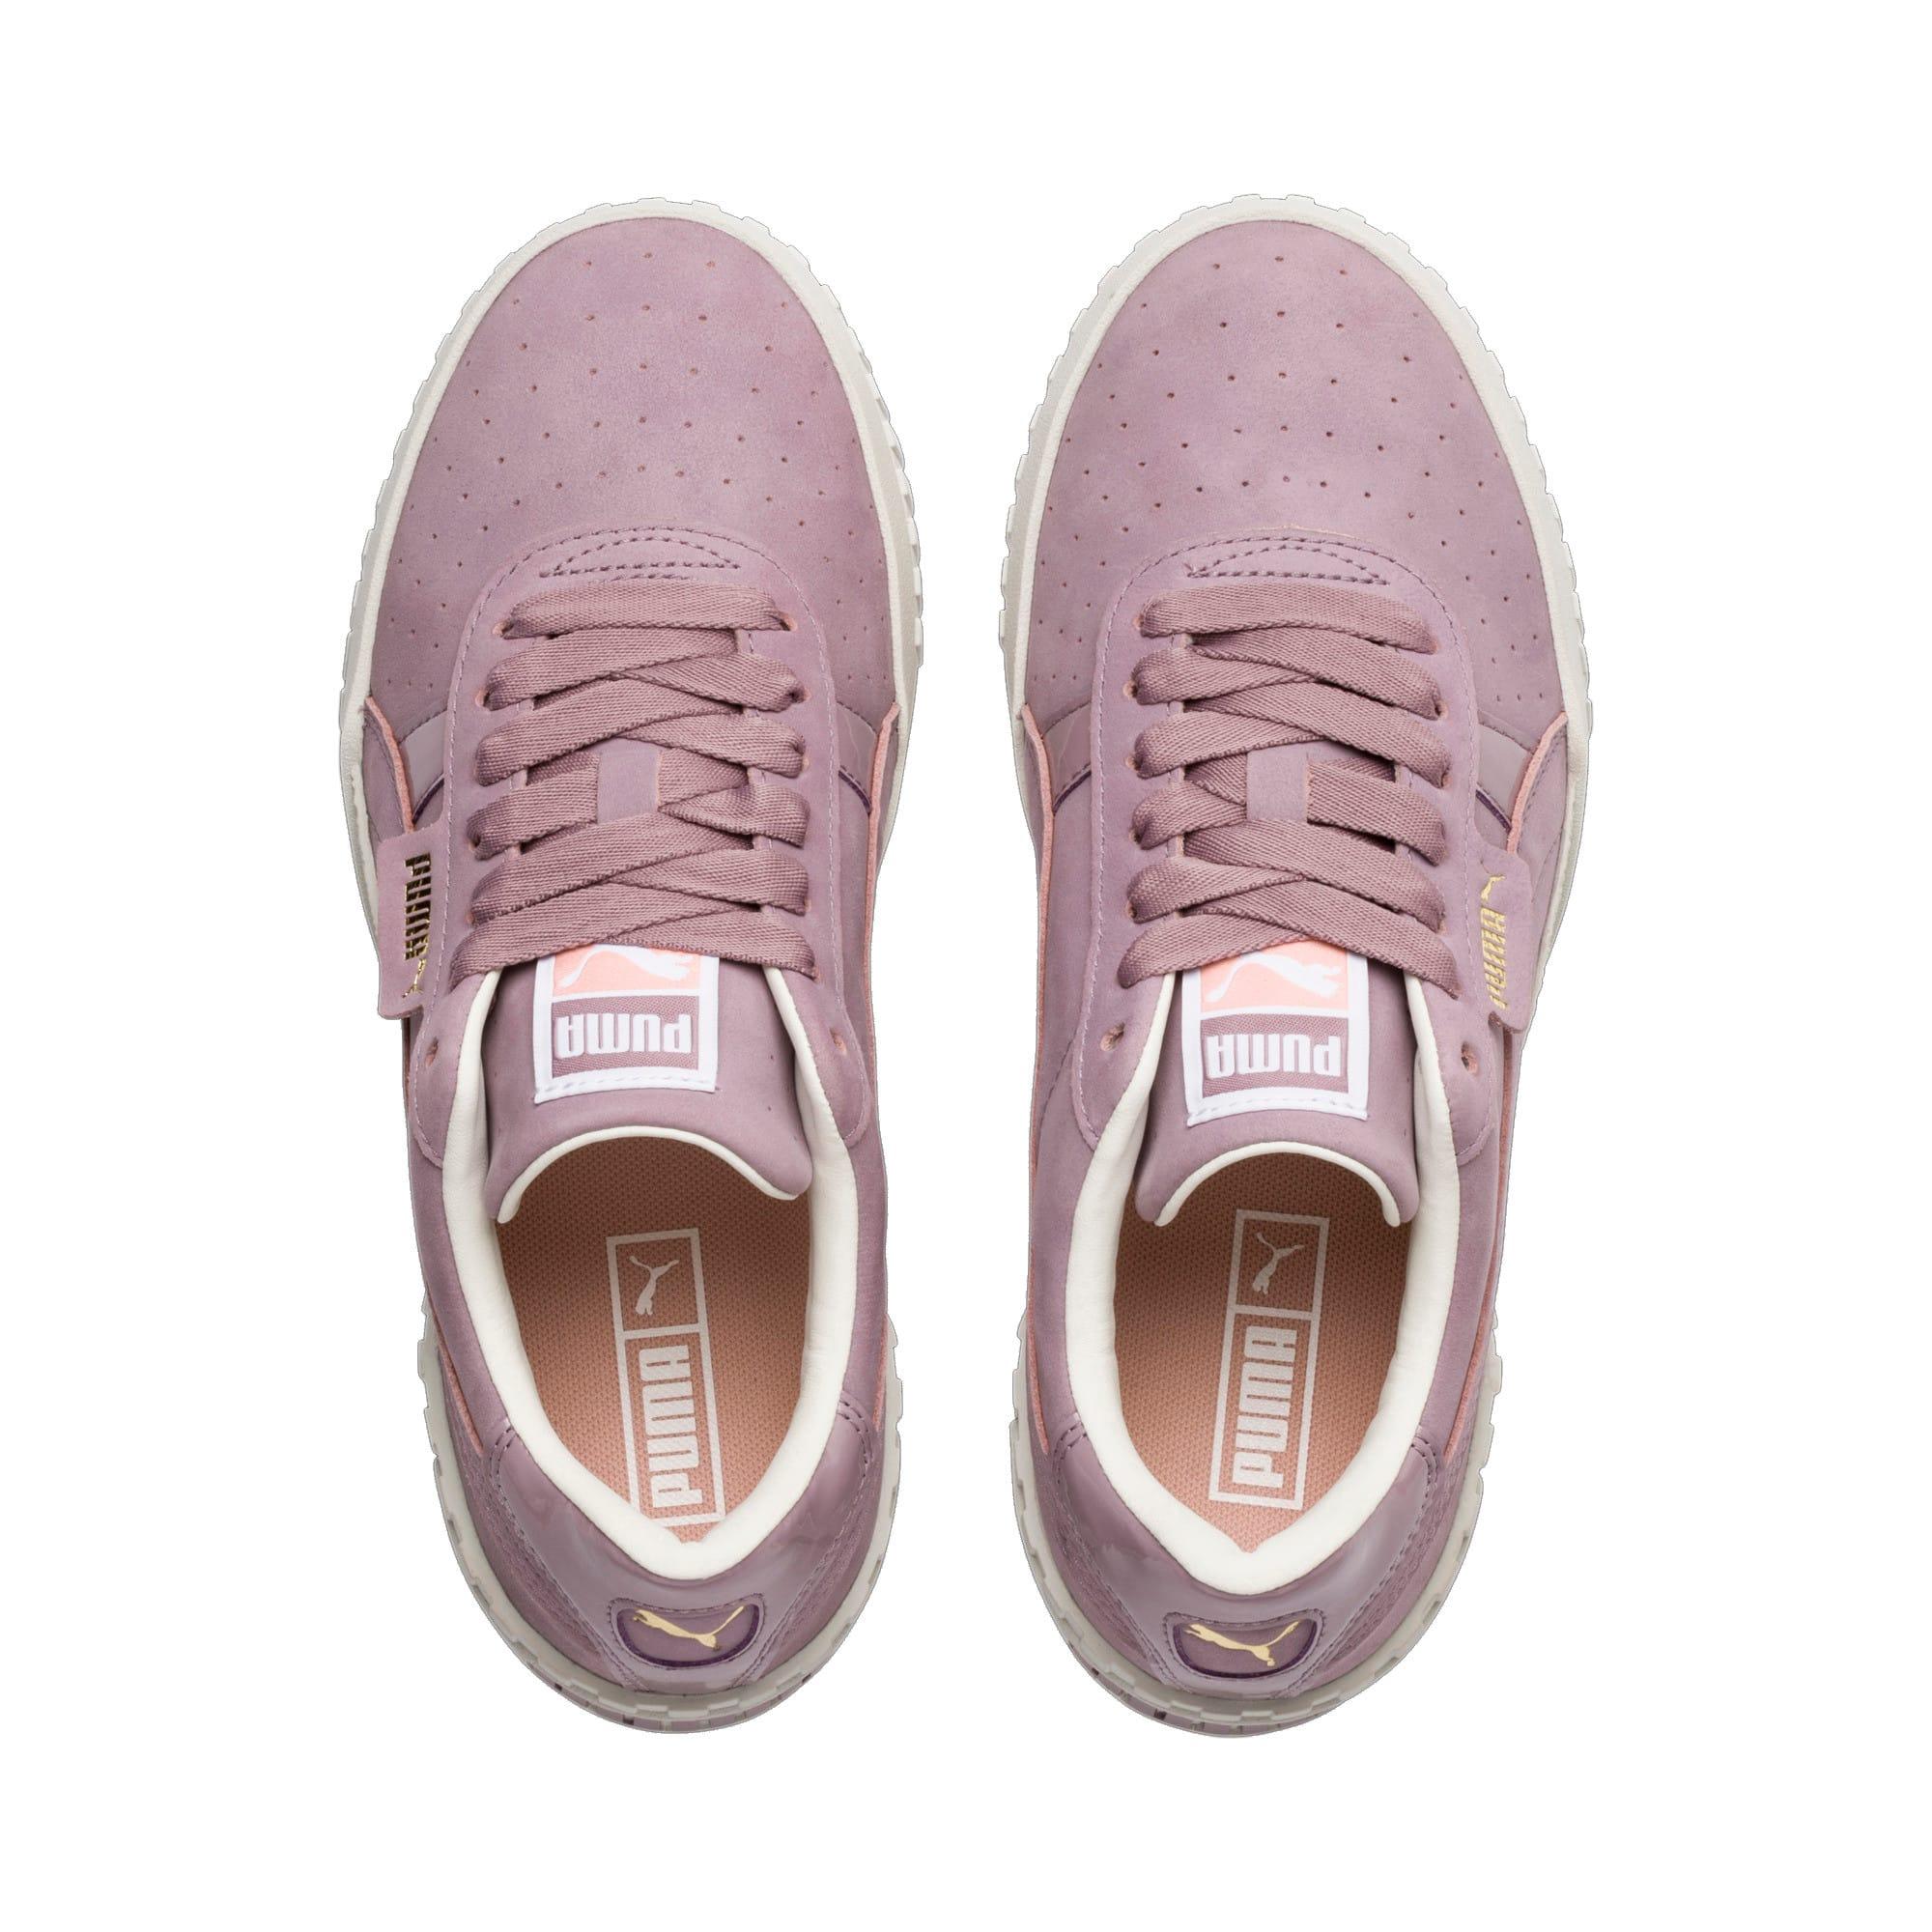 Thumbnail 8 of Cali Nubuck Women's Sneakers, Elderberry, medium